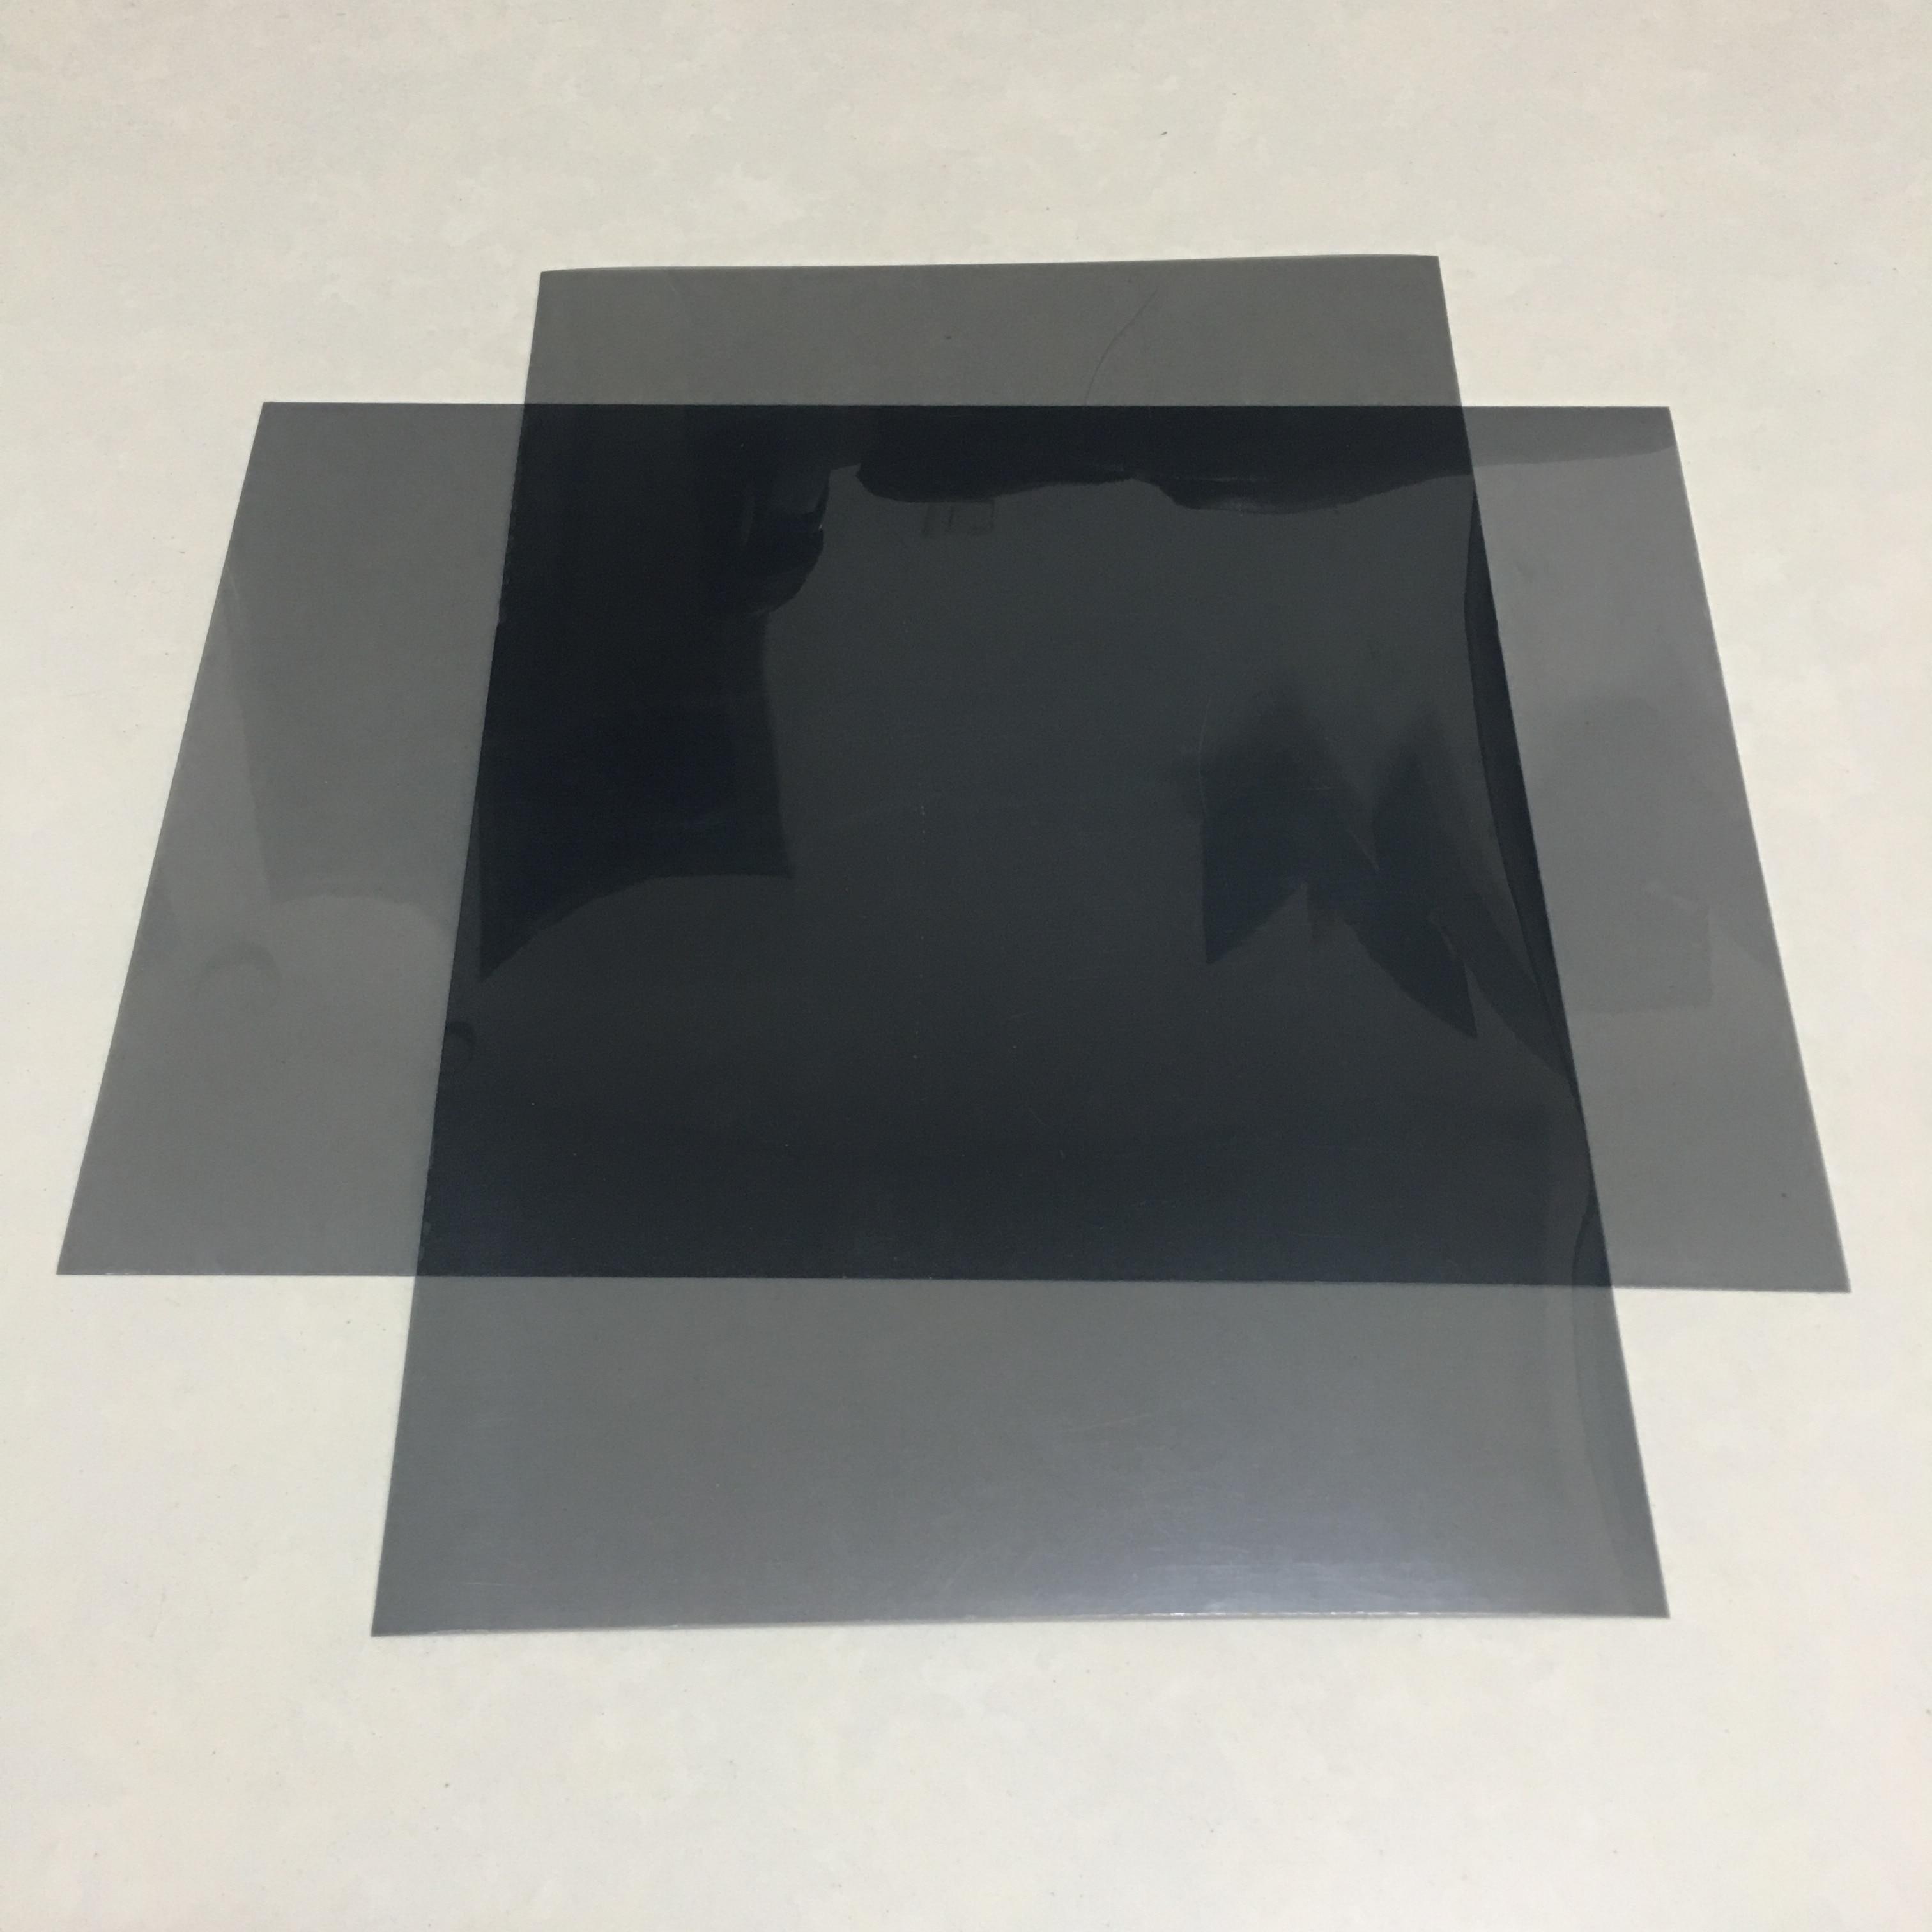 2pcs Pack 30*20CM Horizontal 0 degree Linear polarizer film,polarized filter,polarizer film(China)